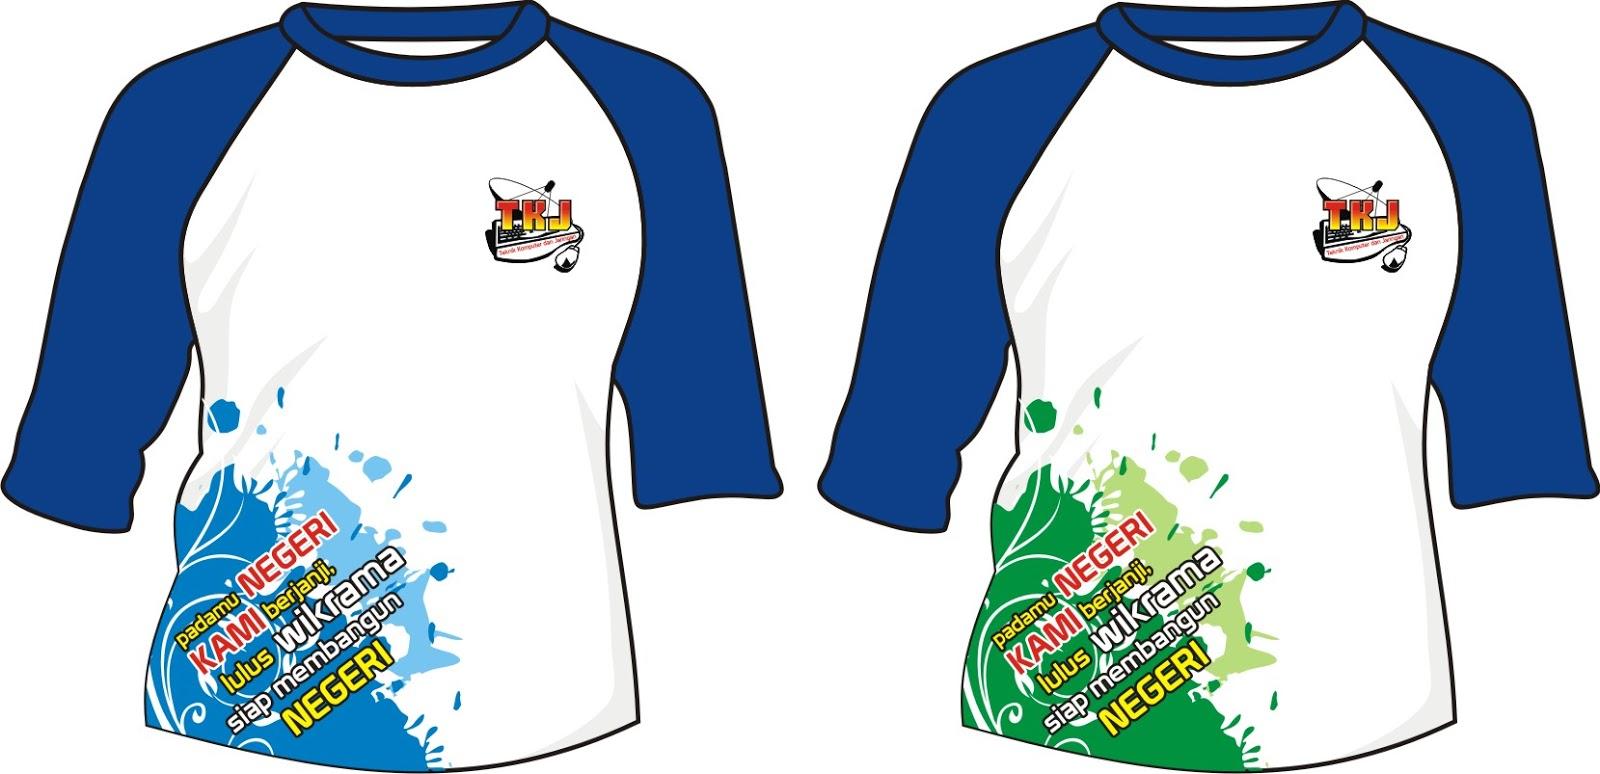 Contoh design tshirt kelas - Contoh Desain Kaos T Shirt Raglan